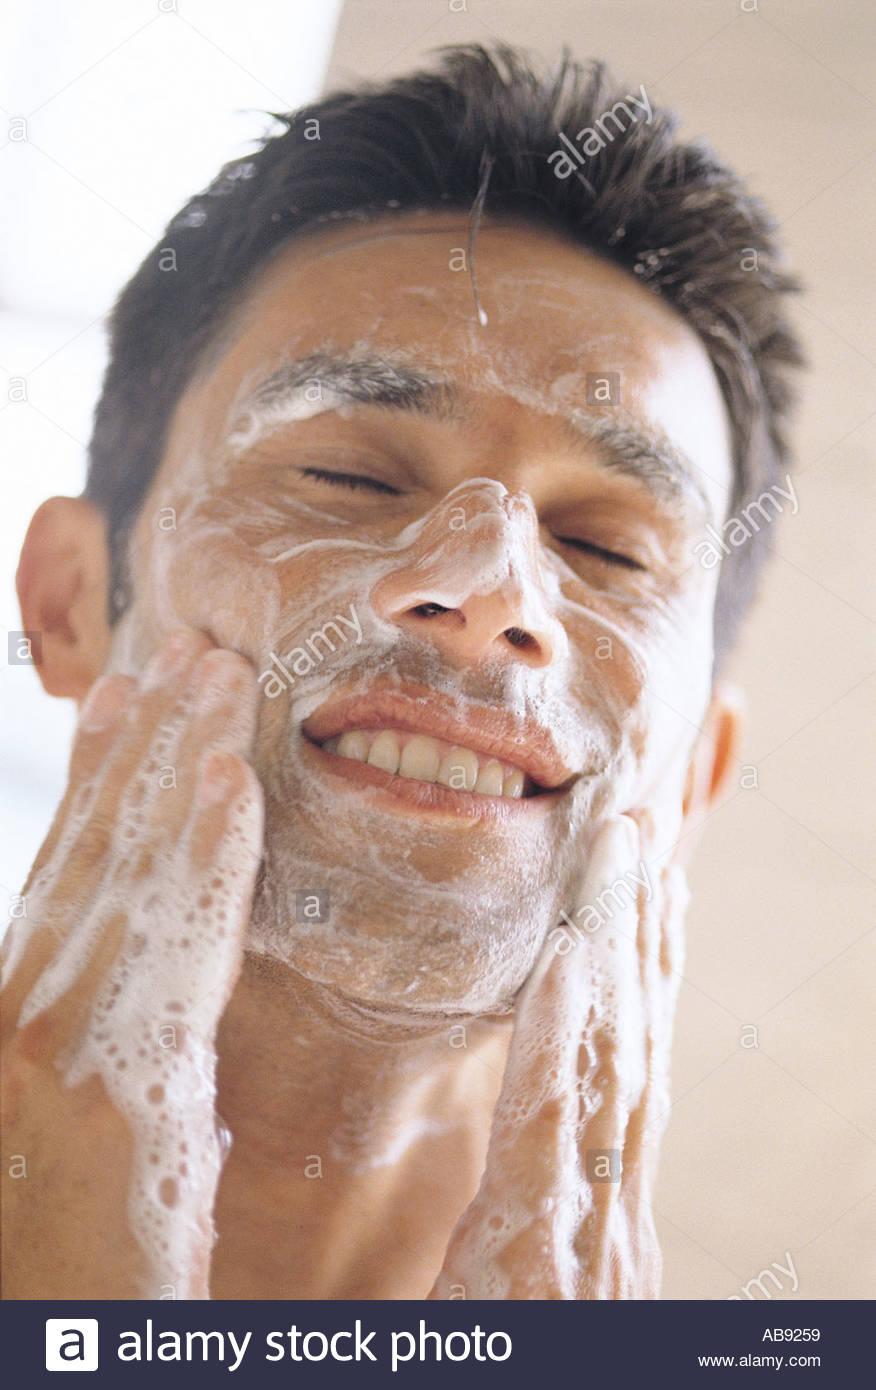 Nettoyage visage homme Photo Stock